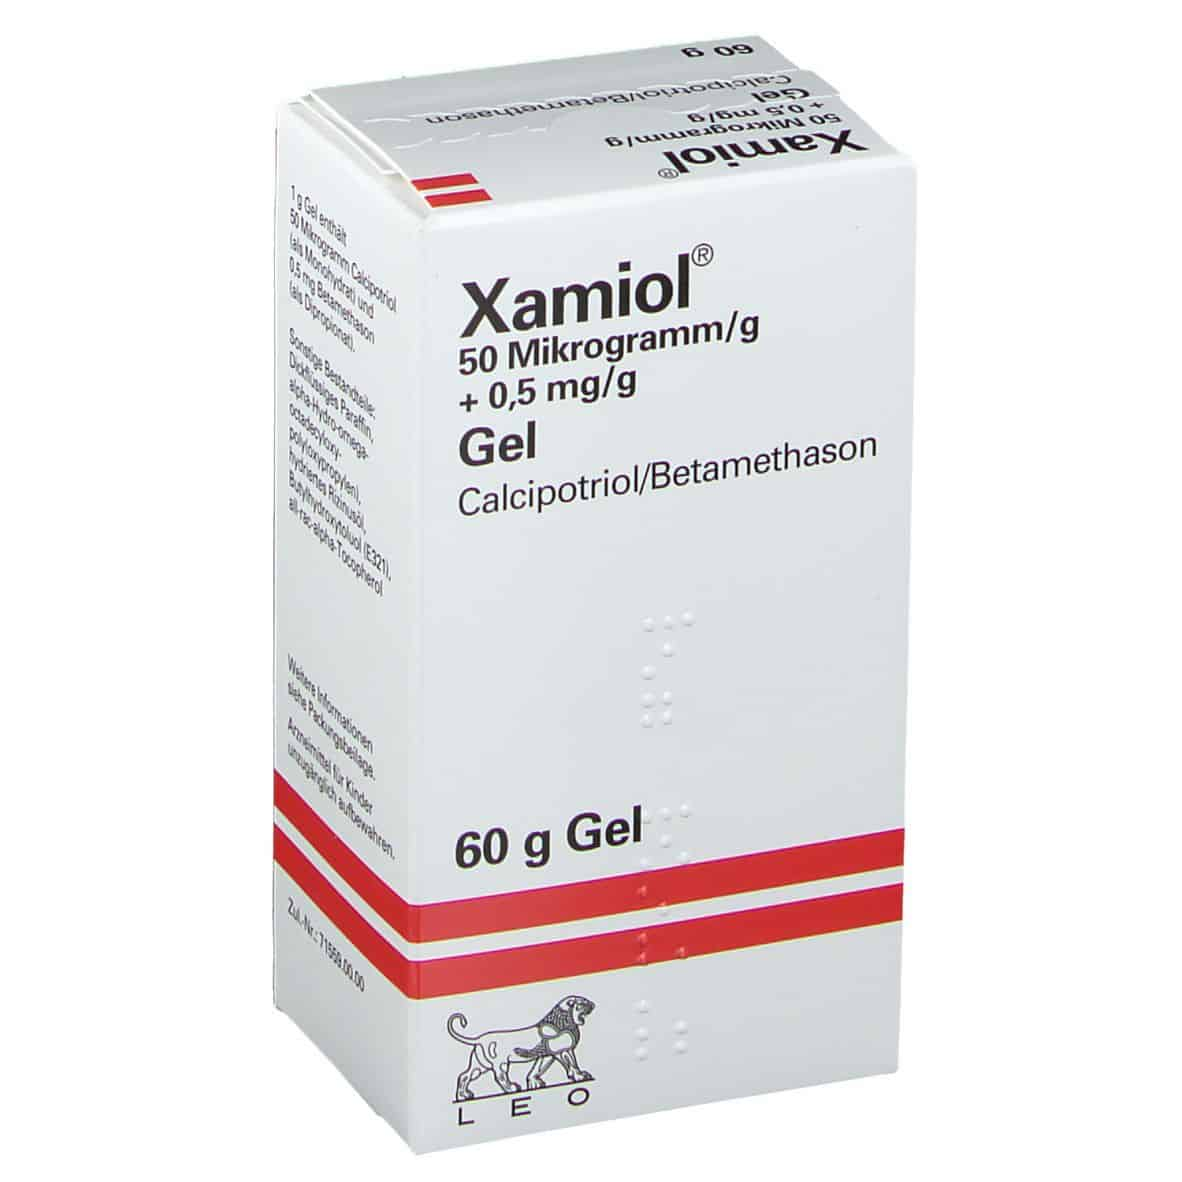 xamiol gel uses